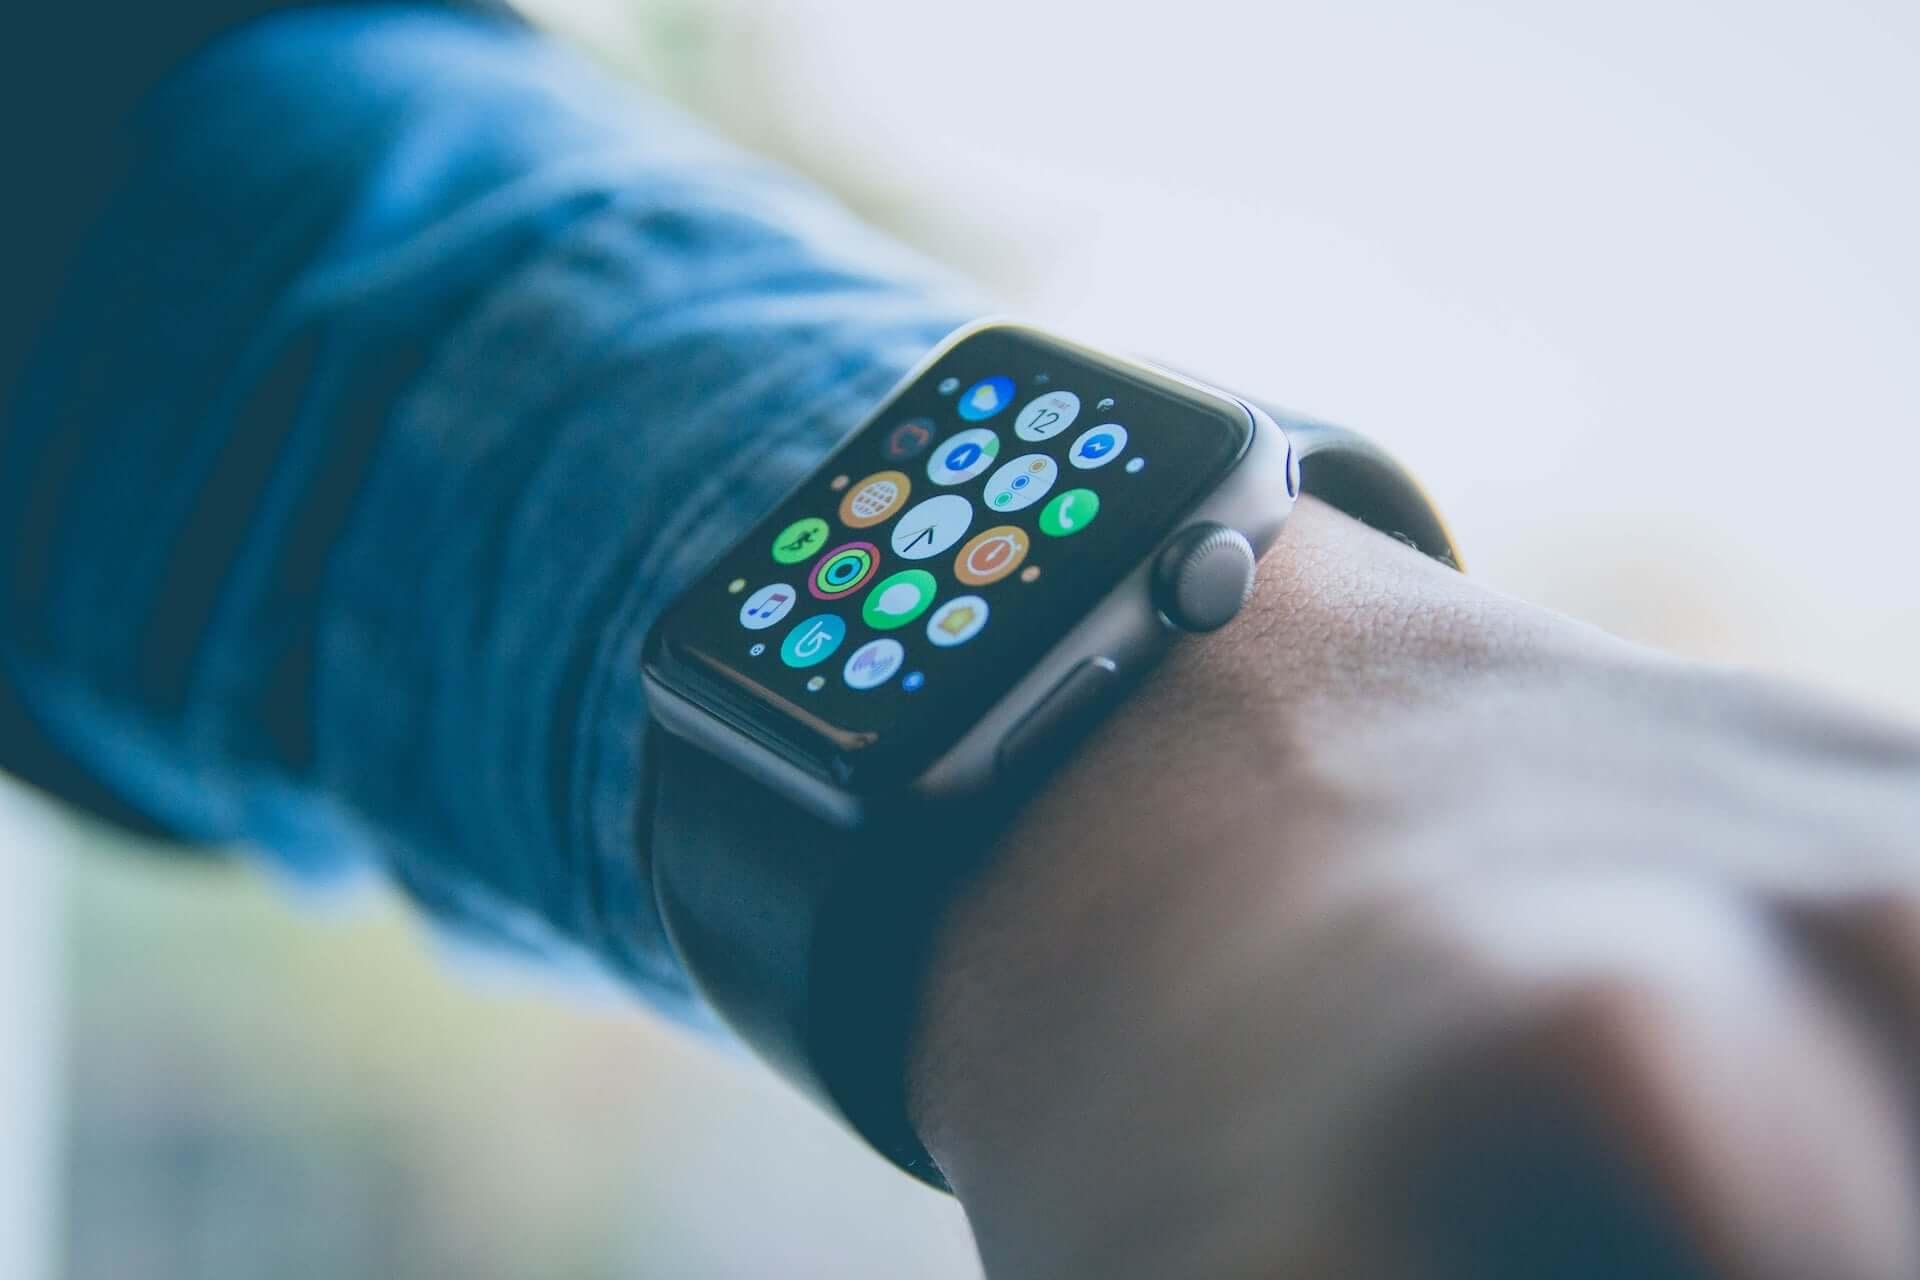 iPhone、Apple Watchで認知症が判明!?Apple、医薬品会社と共同研究 tech190808_iphone_applewatch_main-1920x1280